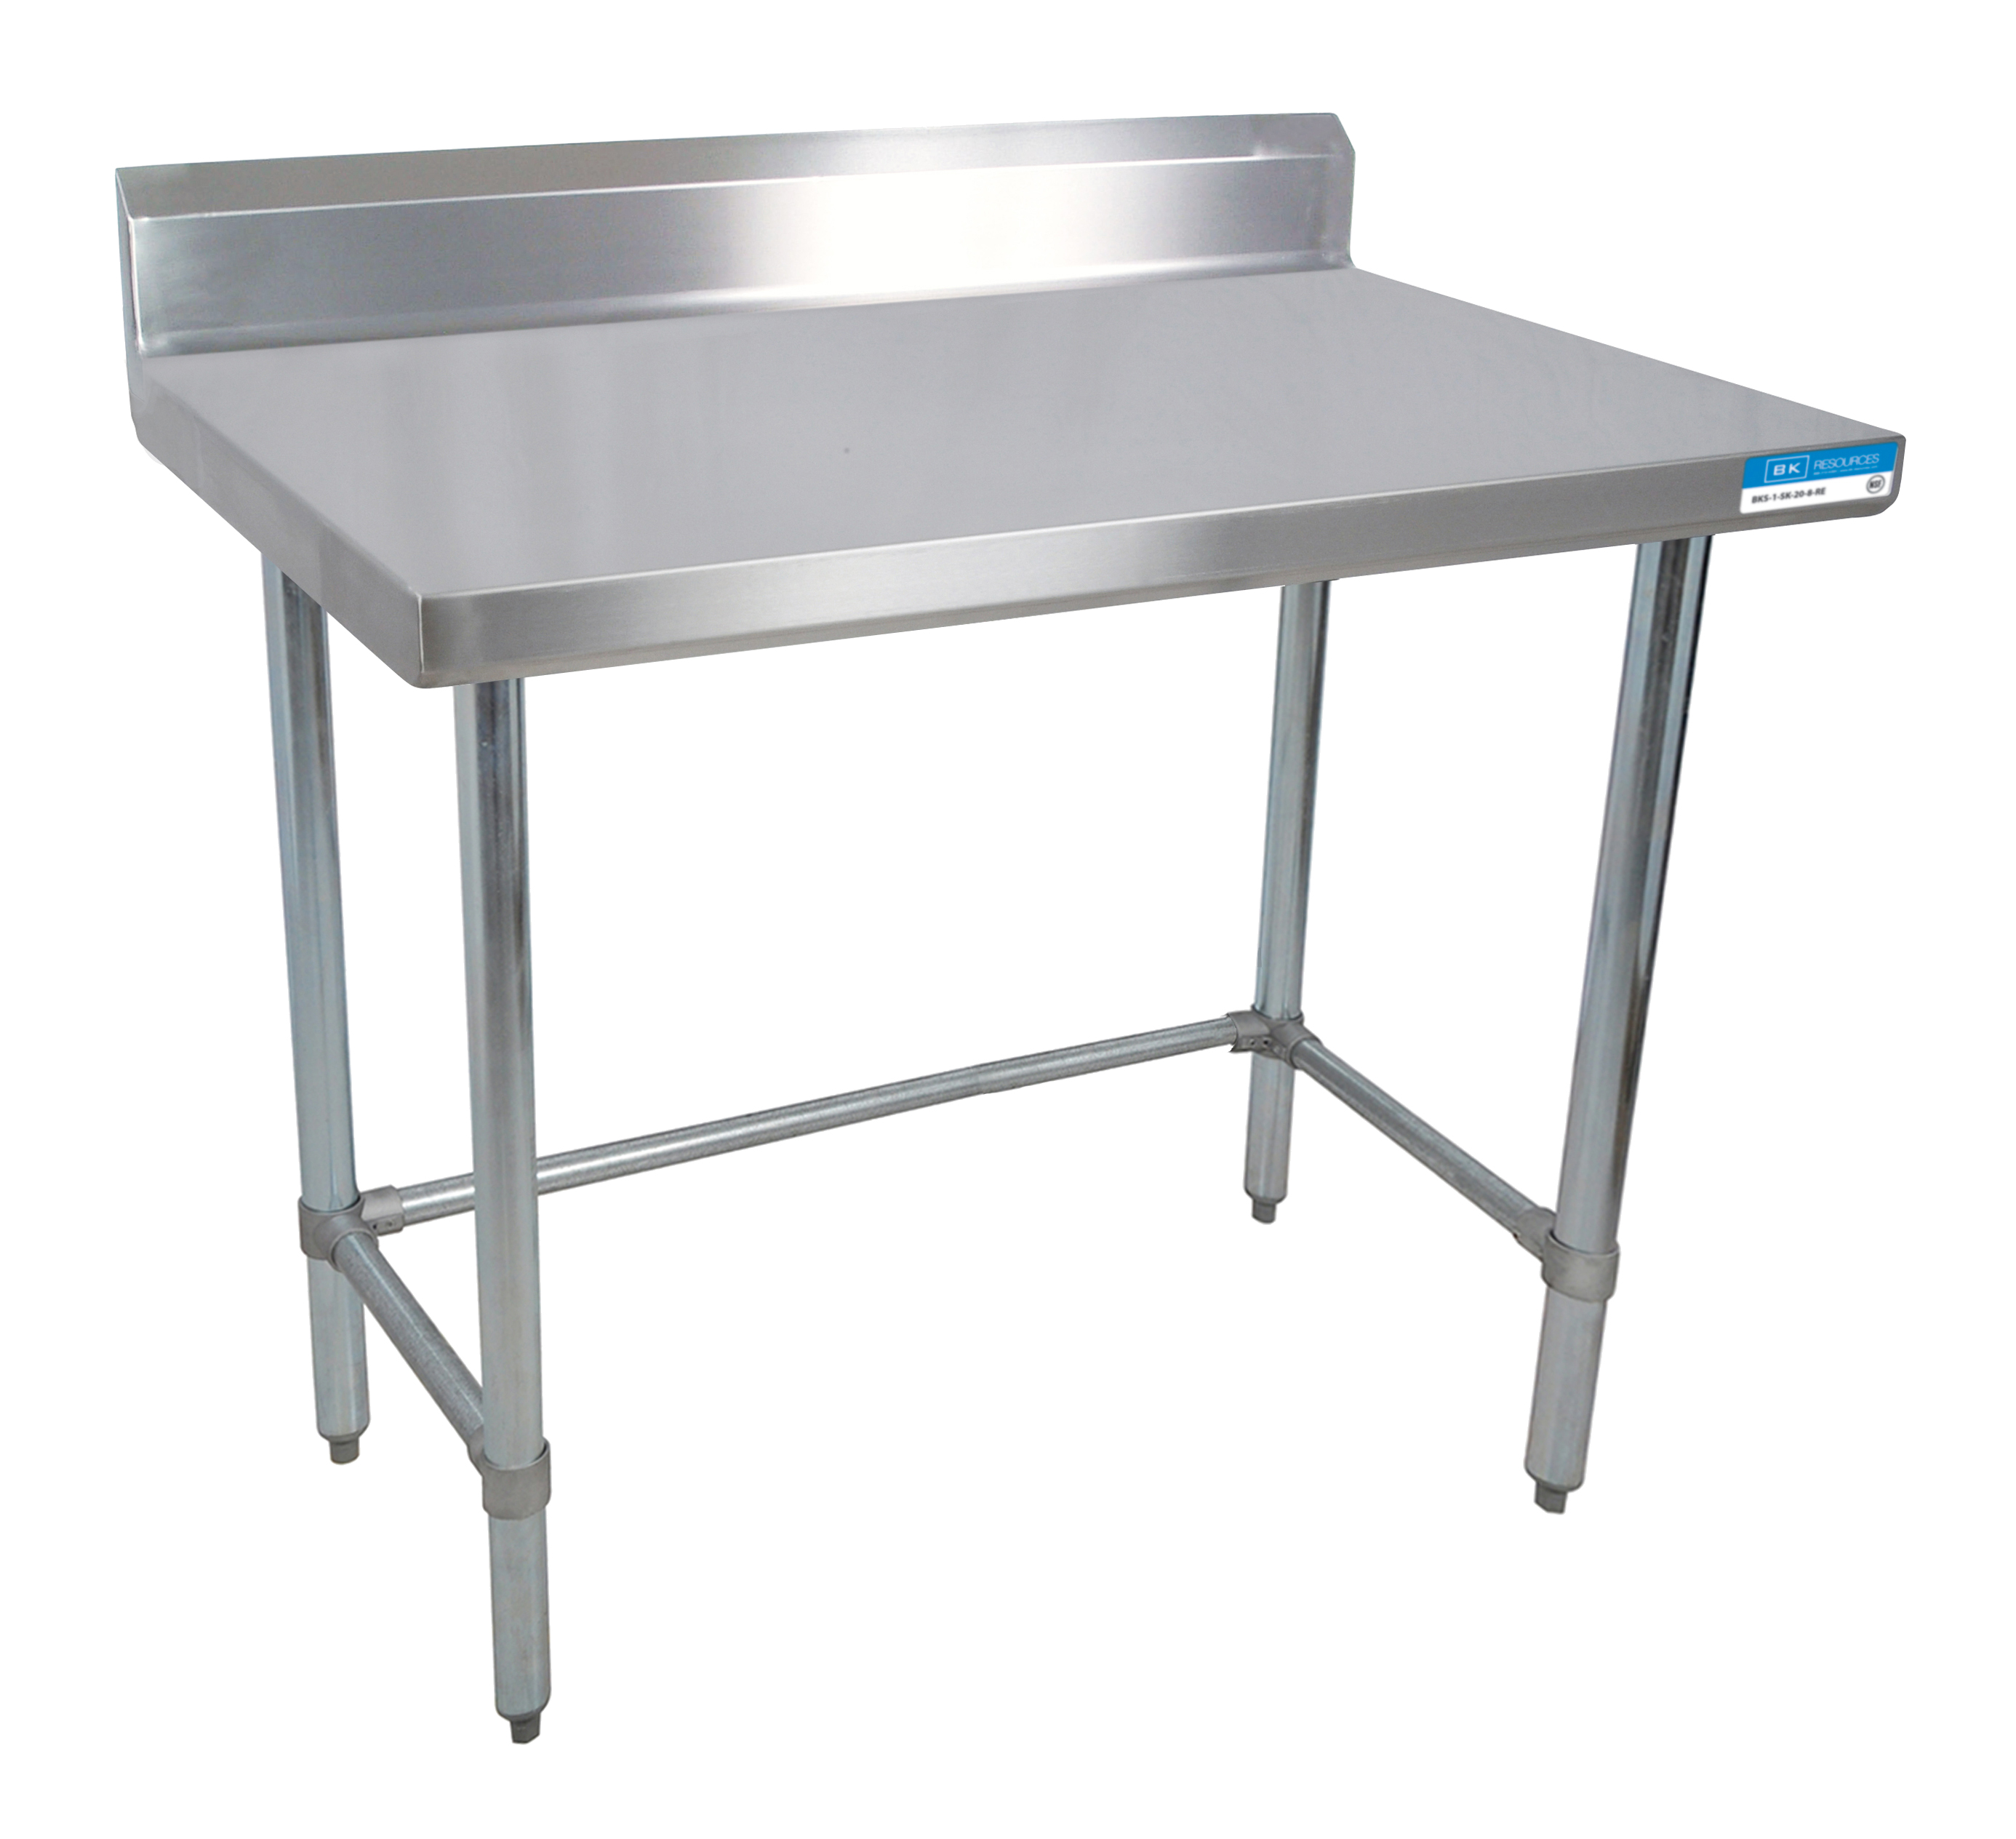 BK Resources QVTR5OB-3630 work table,  36